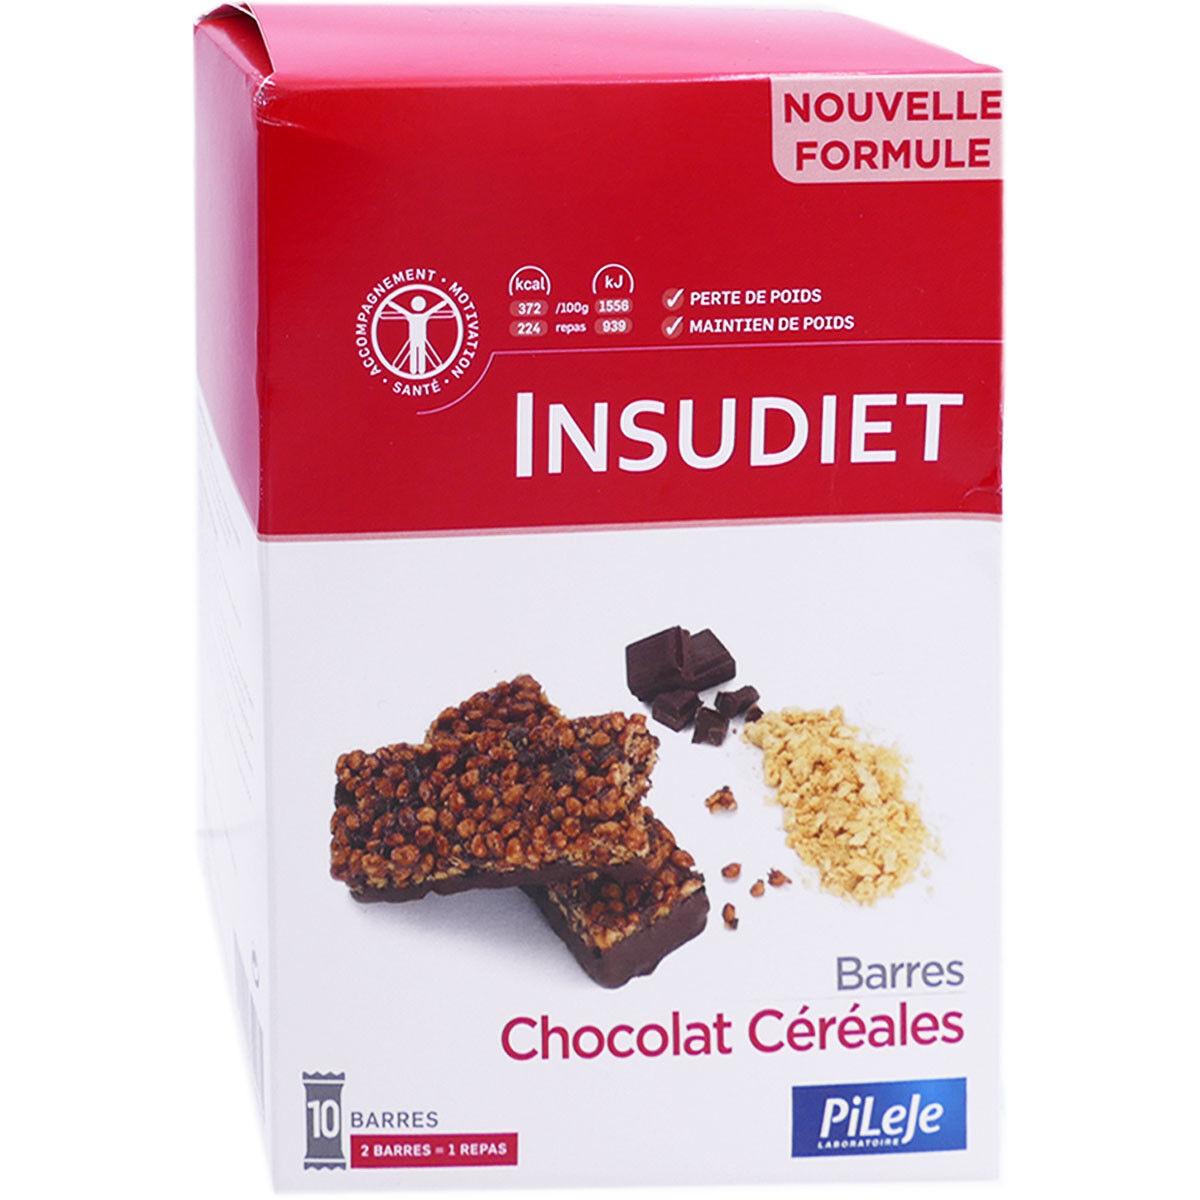 Pileje insudiet 10 barres chocolat cereales 300g